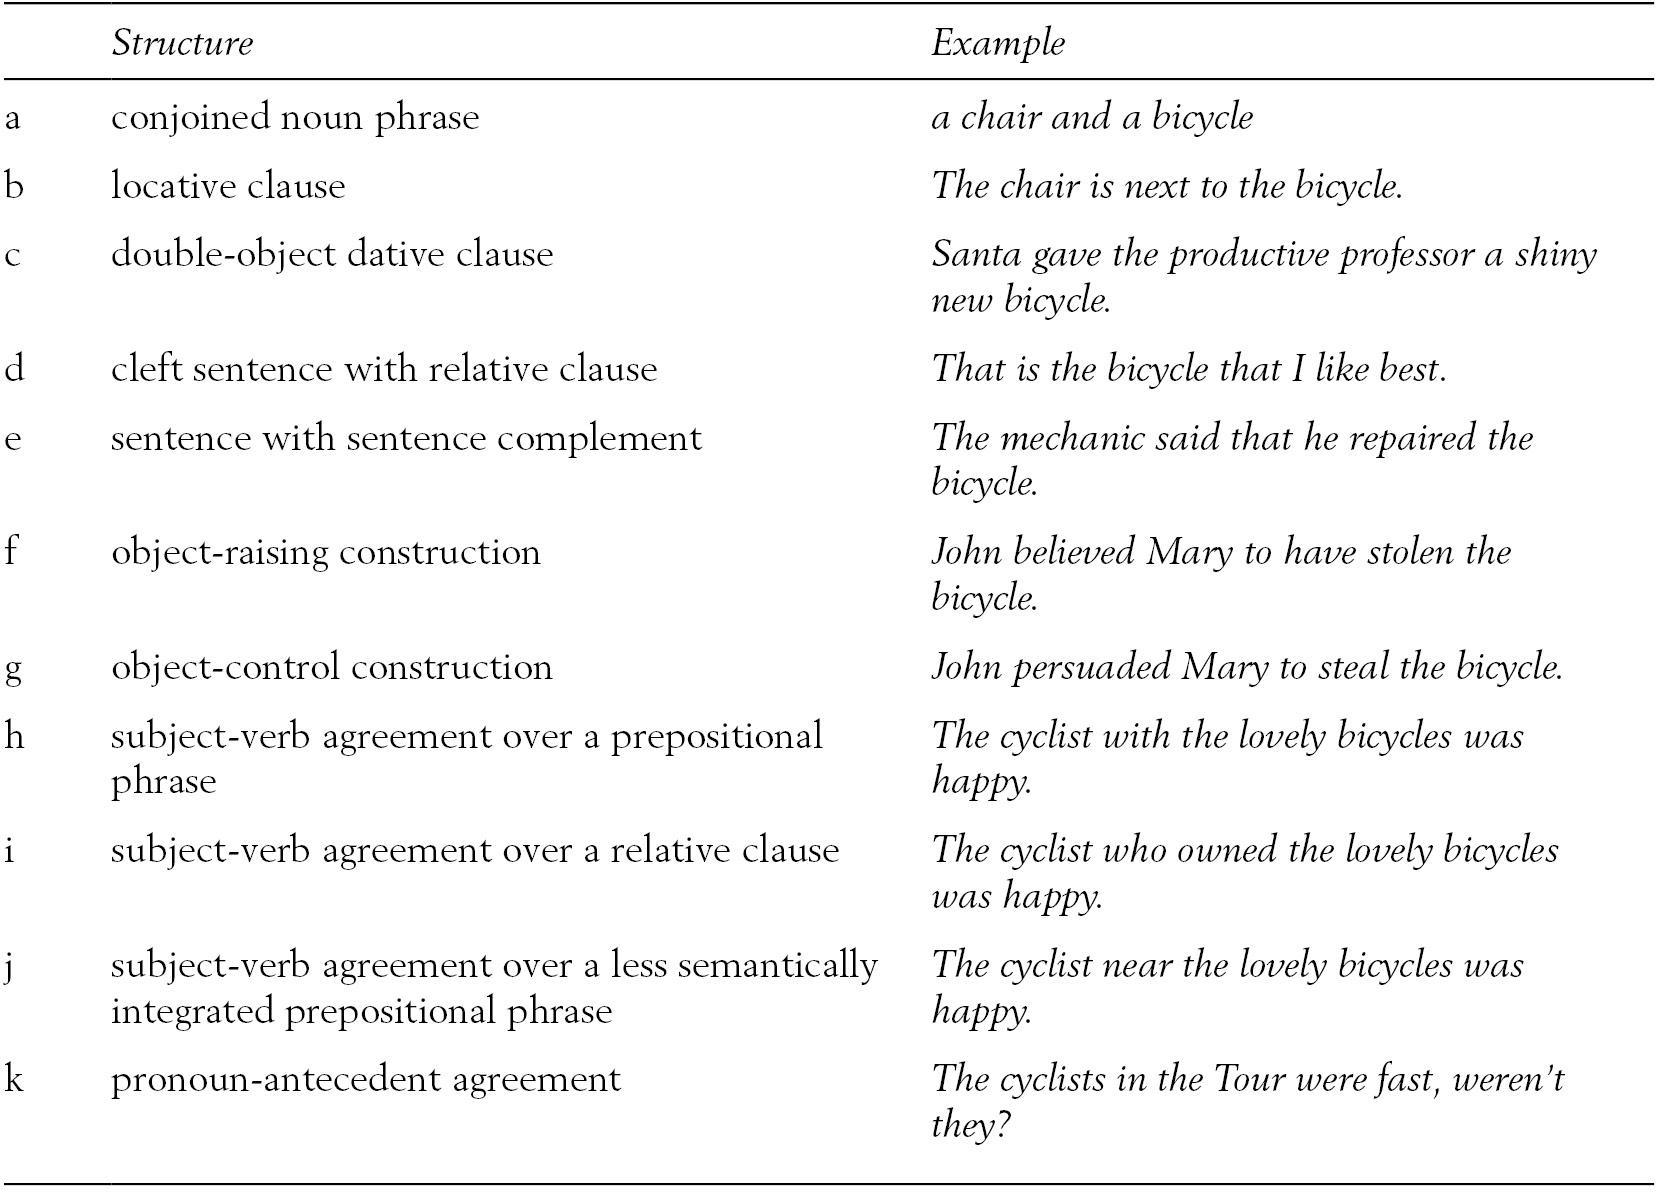 Sentence Production (Section 7) - The Cambridge Handbook of